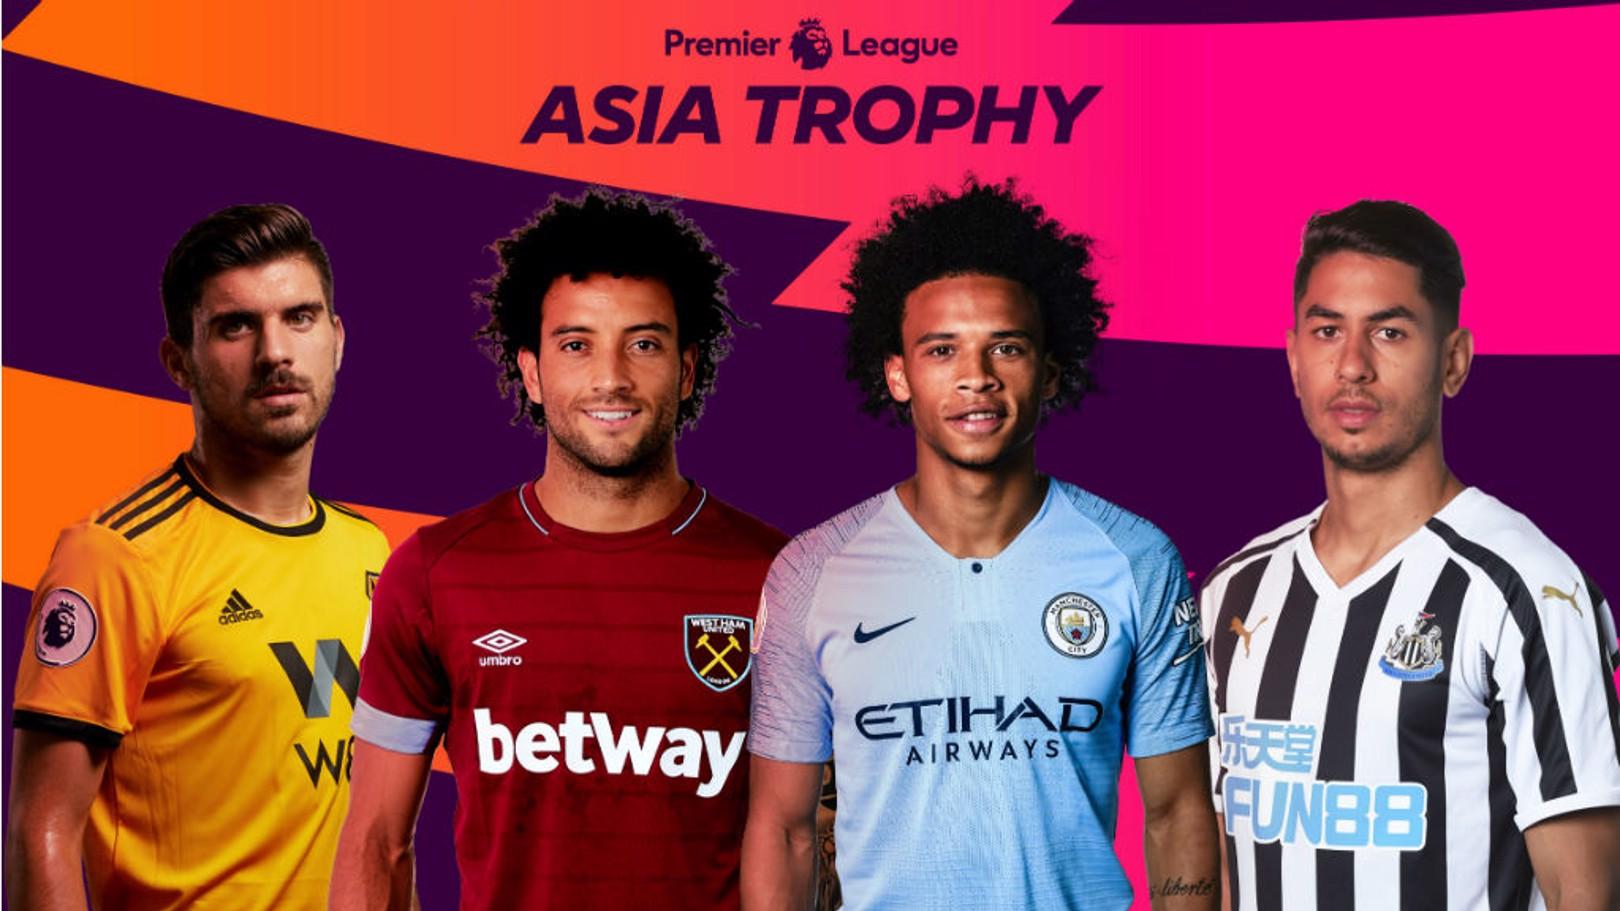 City announce pre-season matches in China